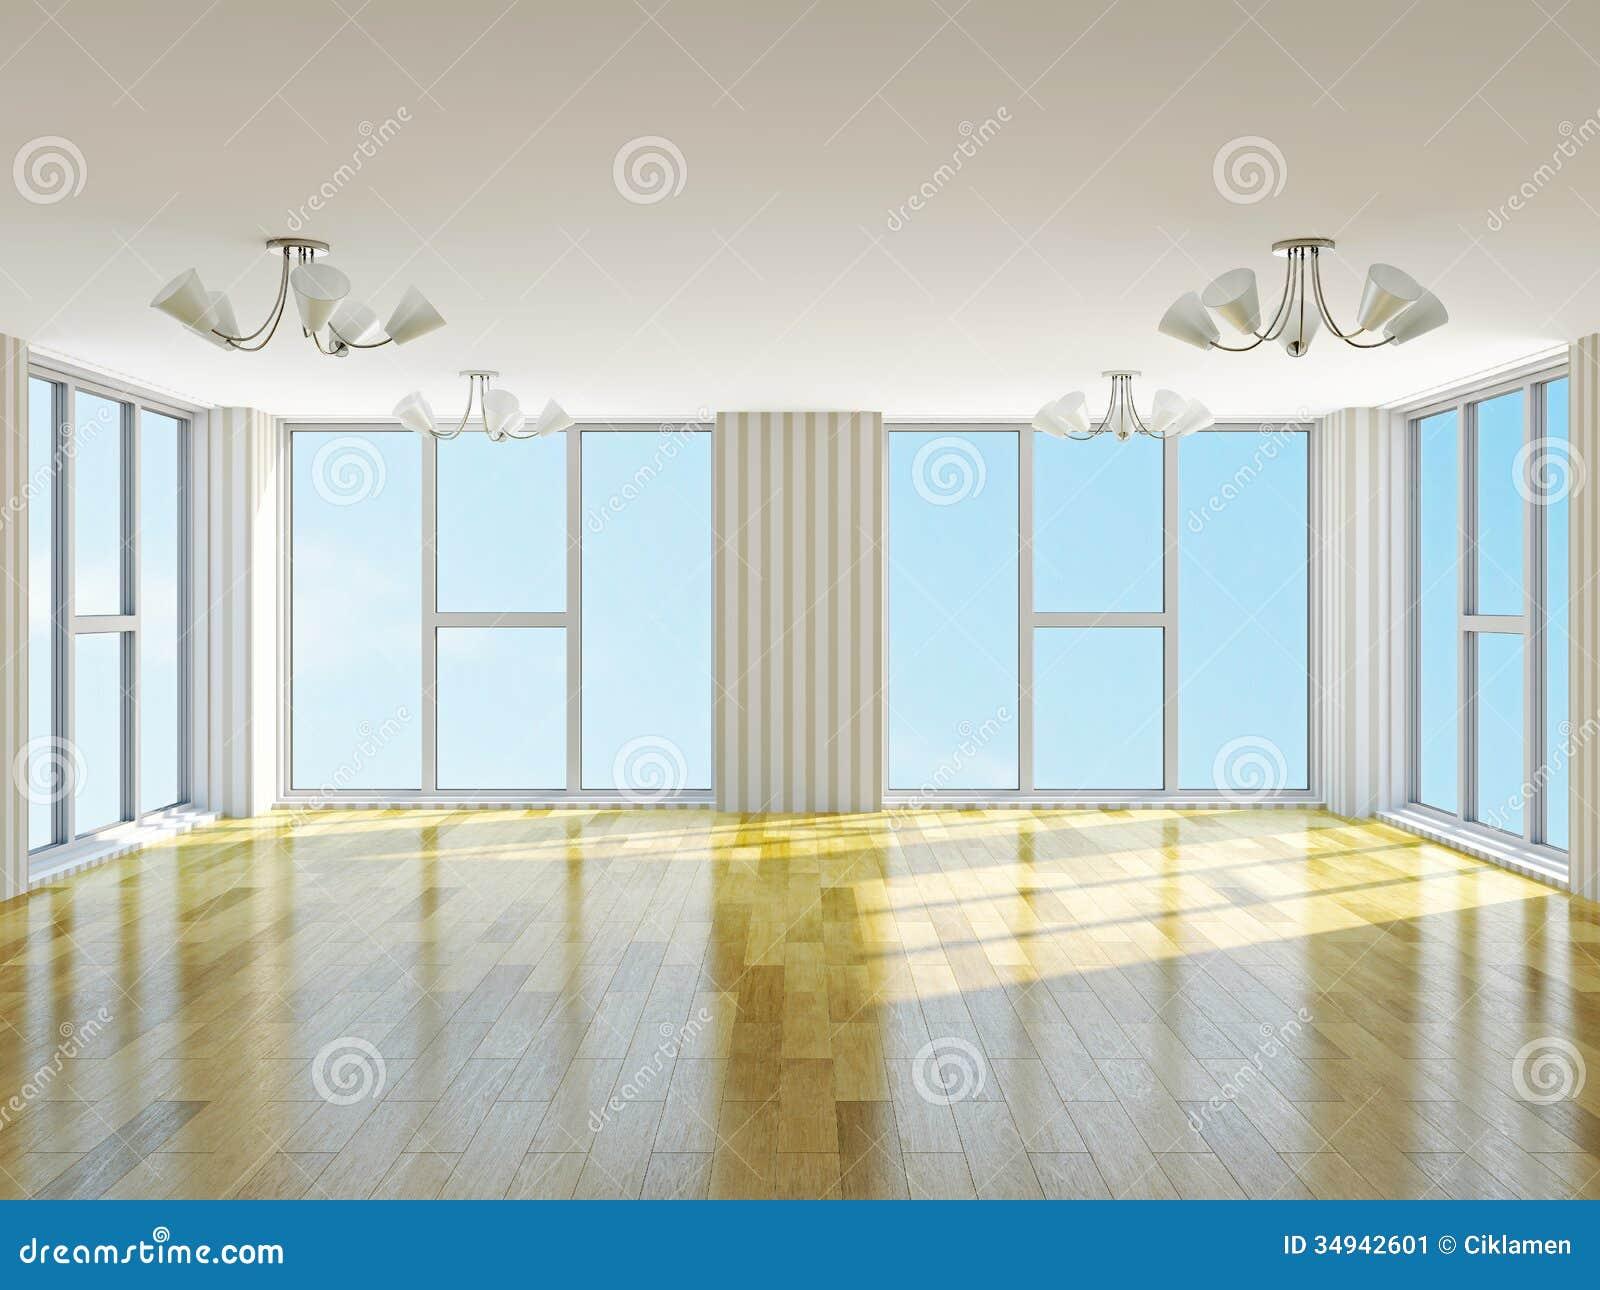 Big empty living room - Empty Room